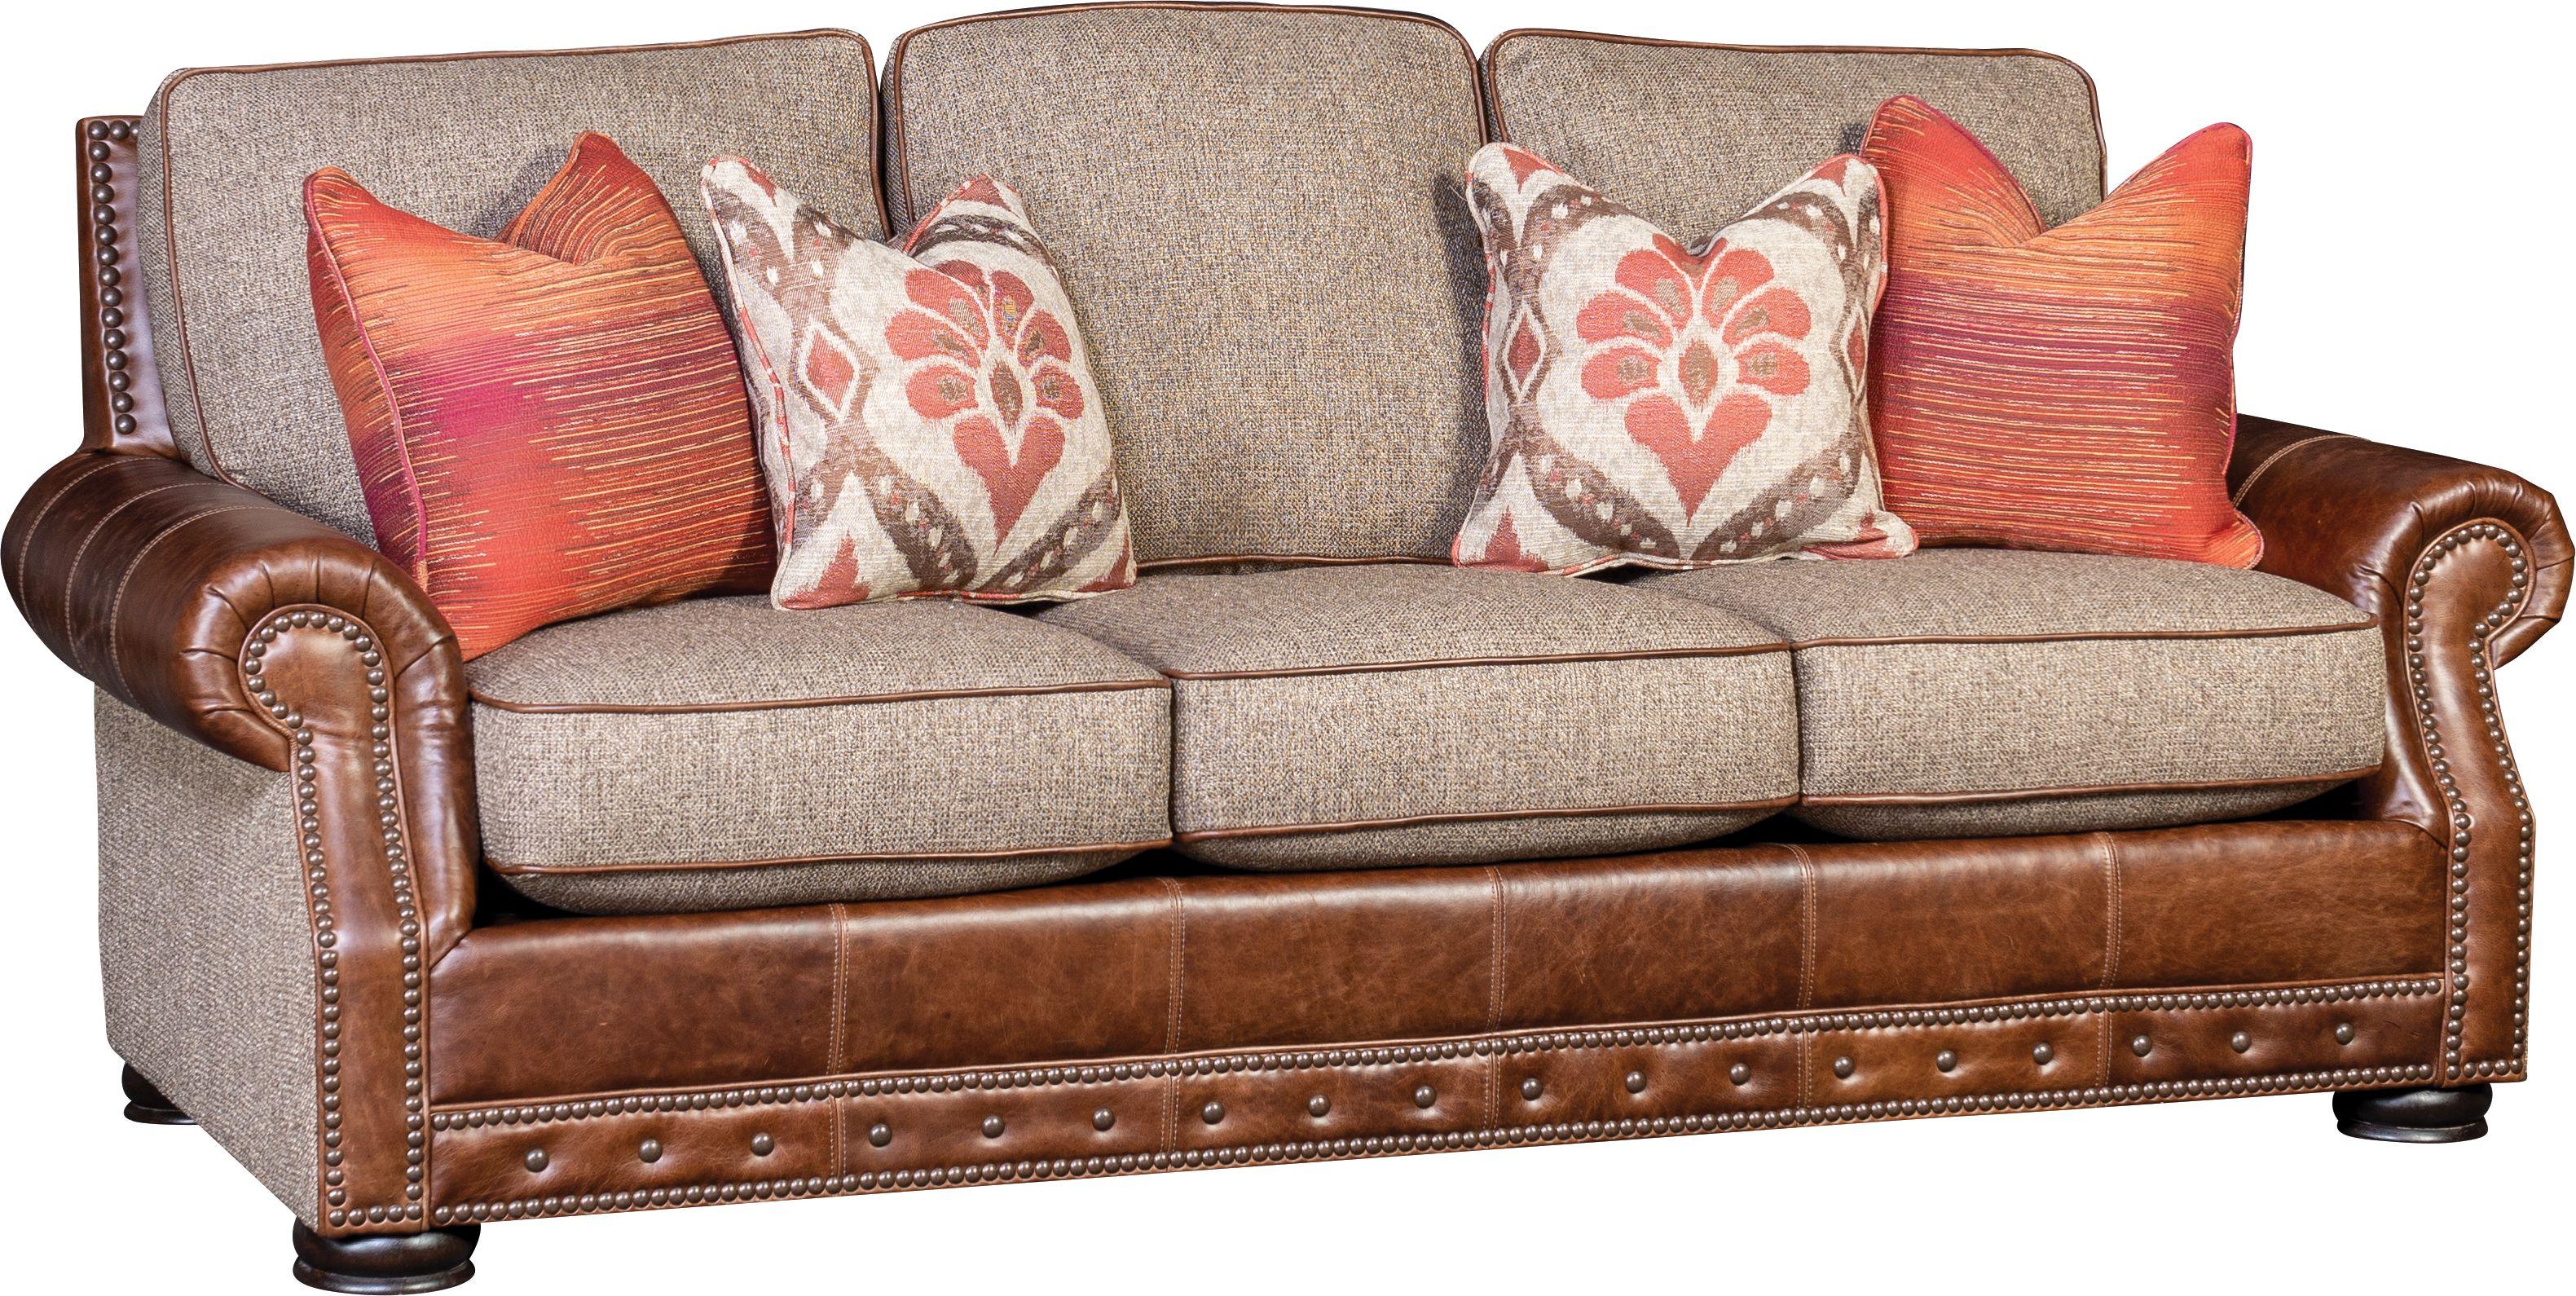 2900LF Sofa in Malibu Timber and Vacchetta Cocoa | Mayo ...